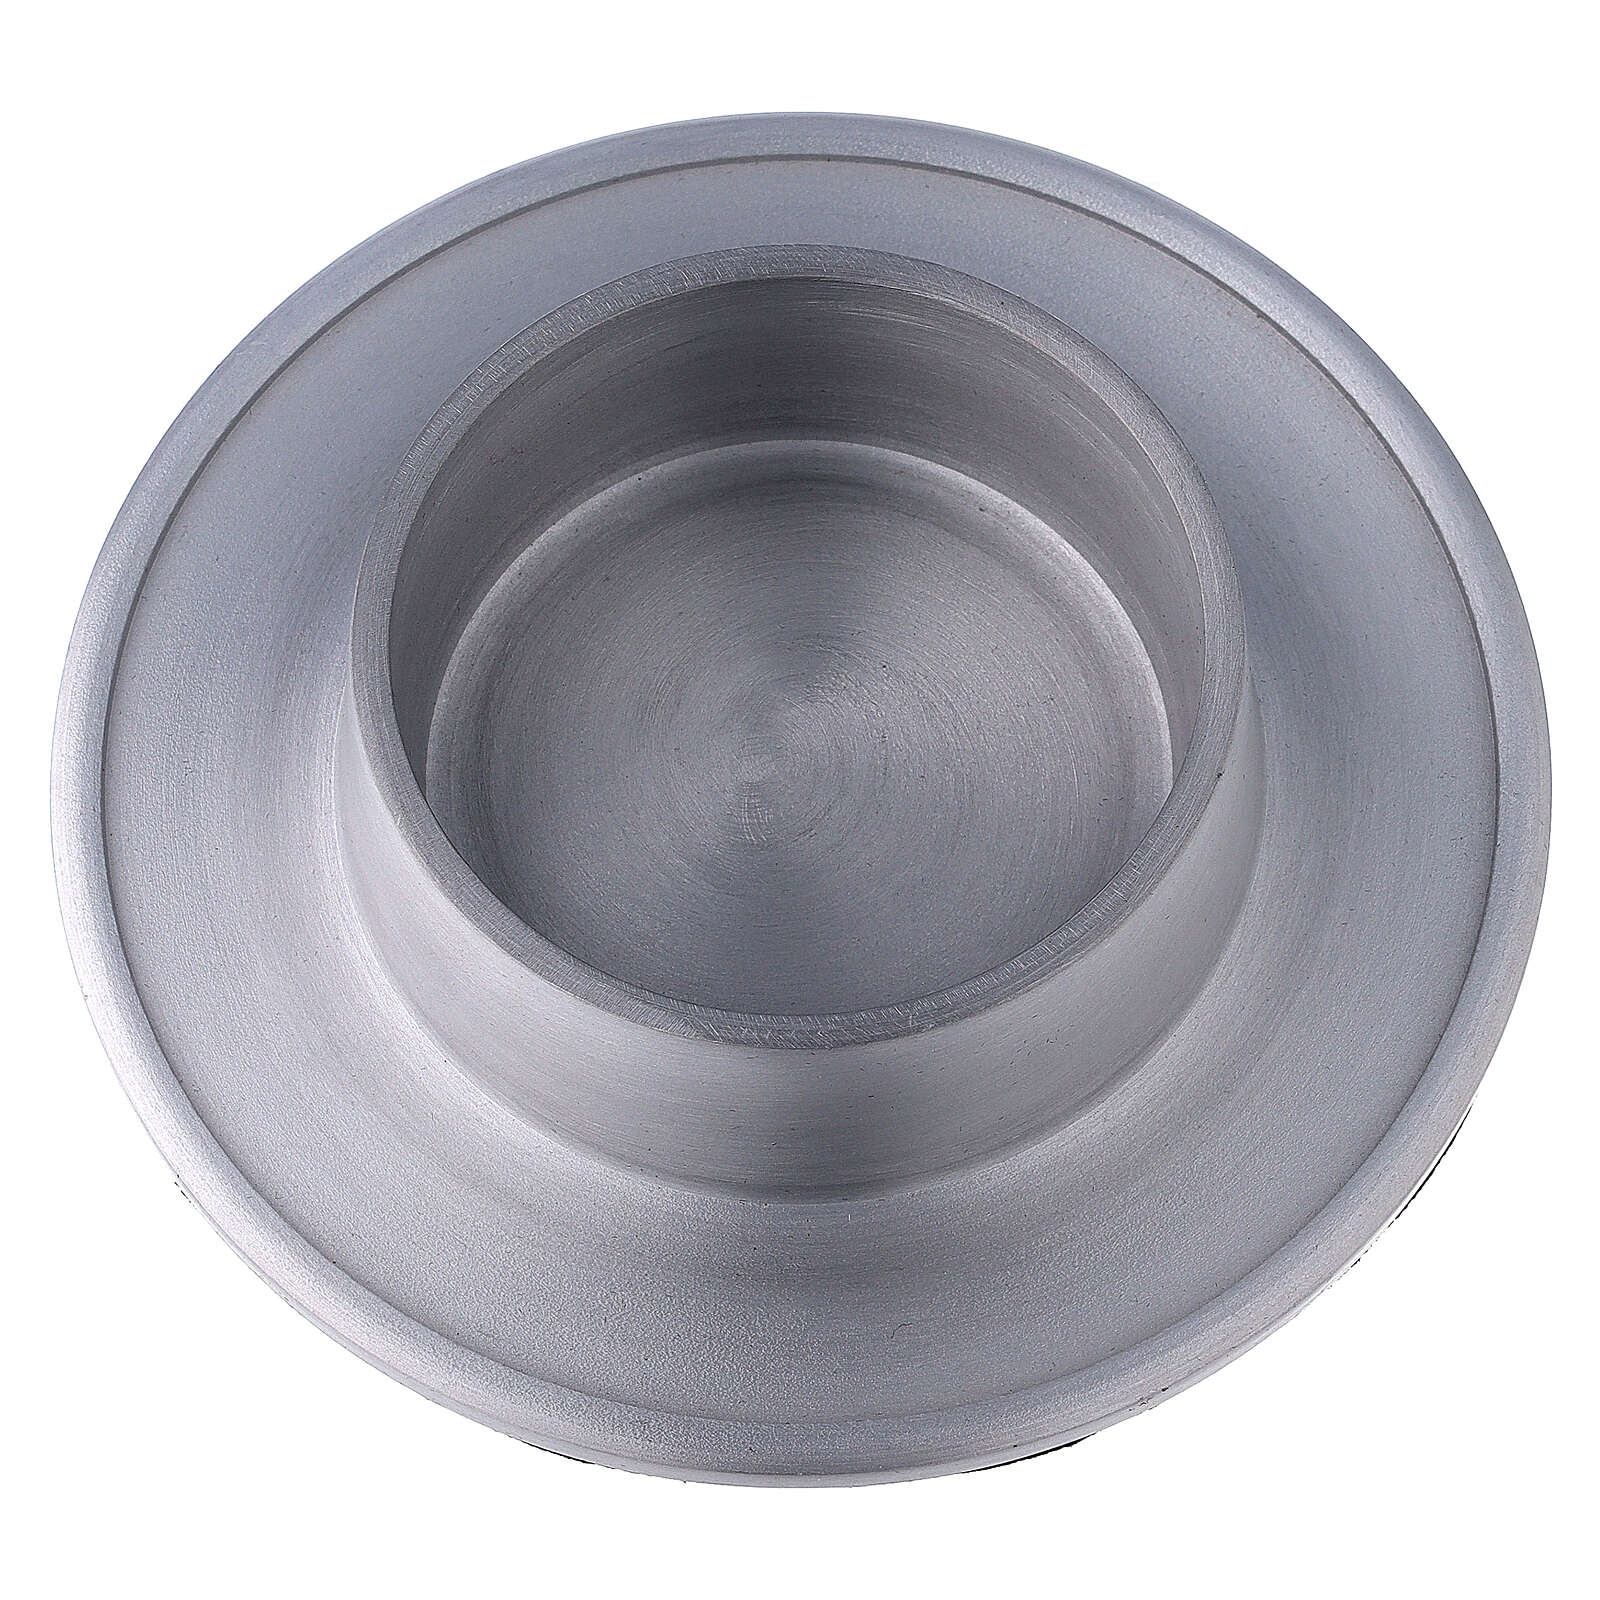 Base portacandela 7 cm alluminio satinato 4